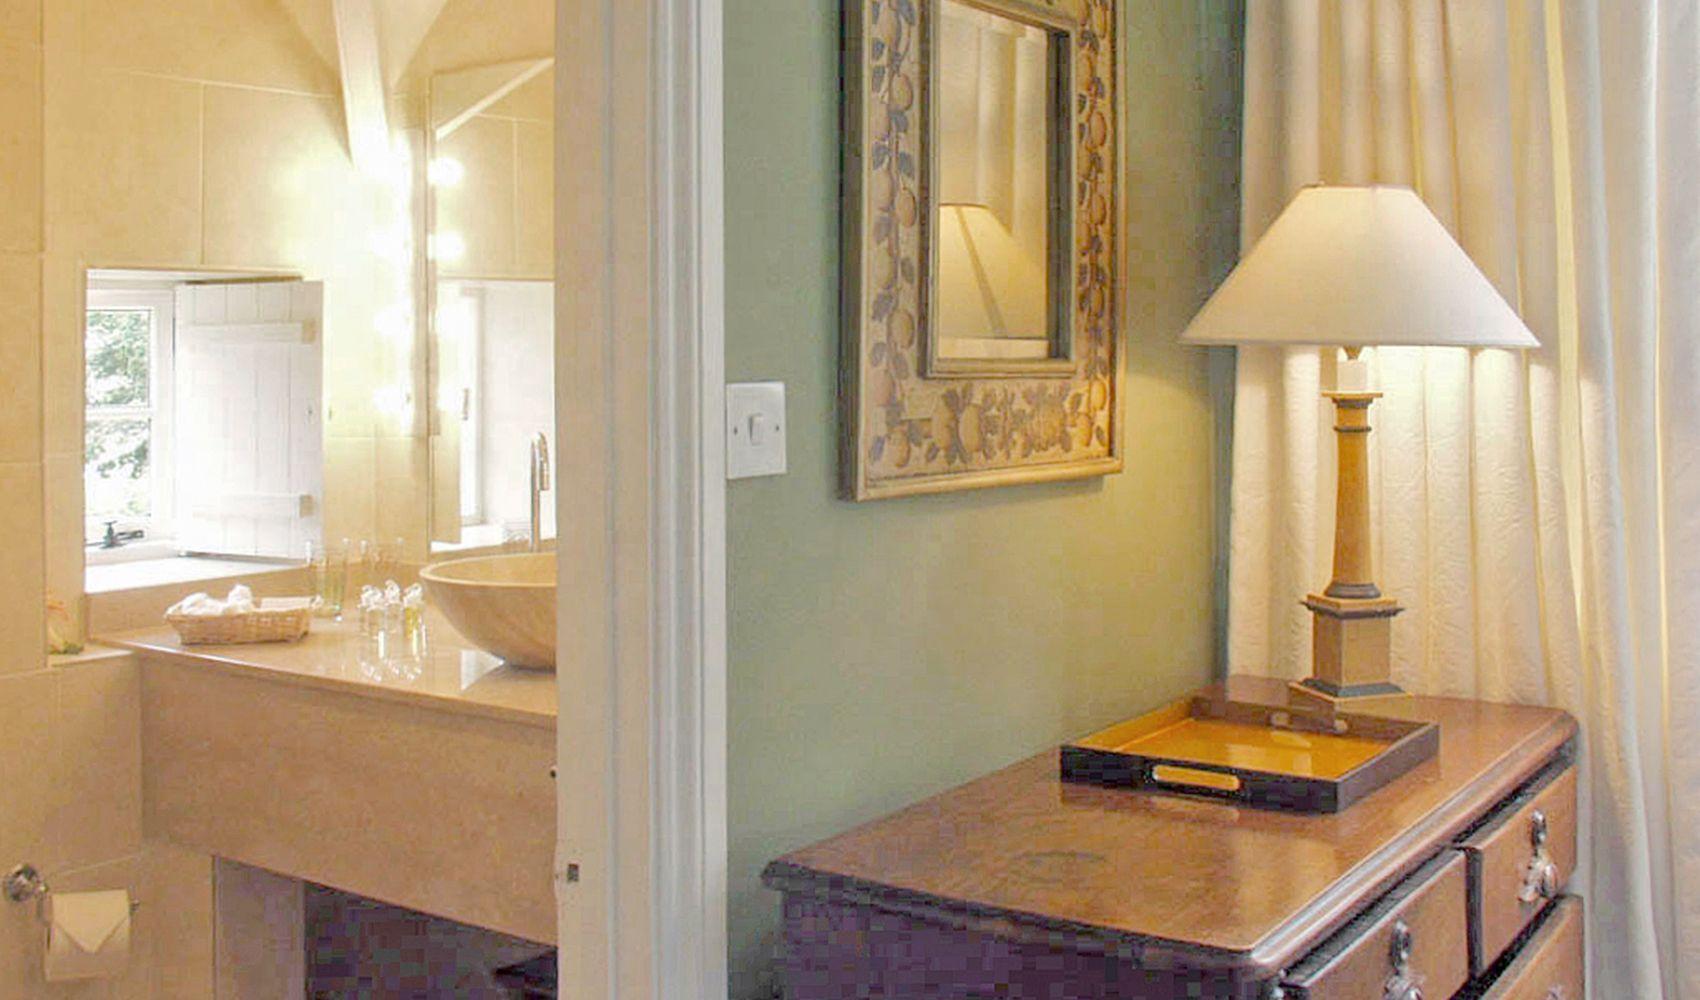 First floor: The master bedroom with an en suite shower room